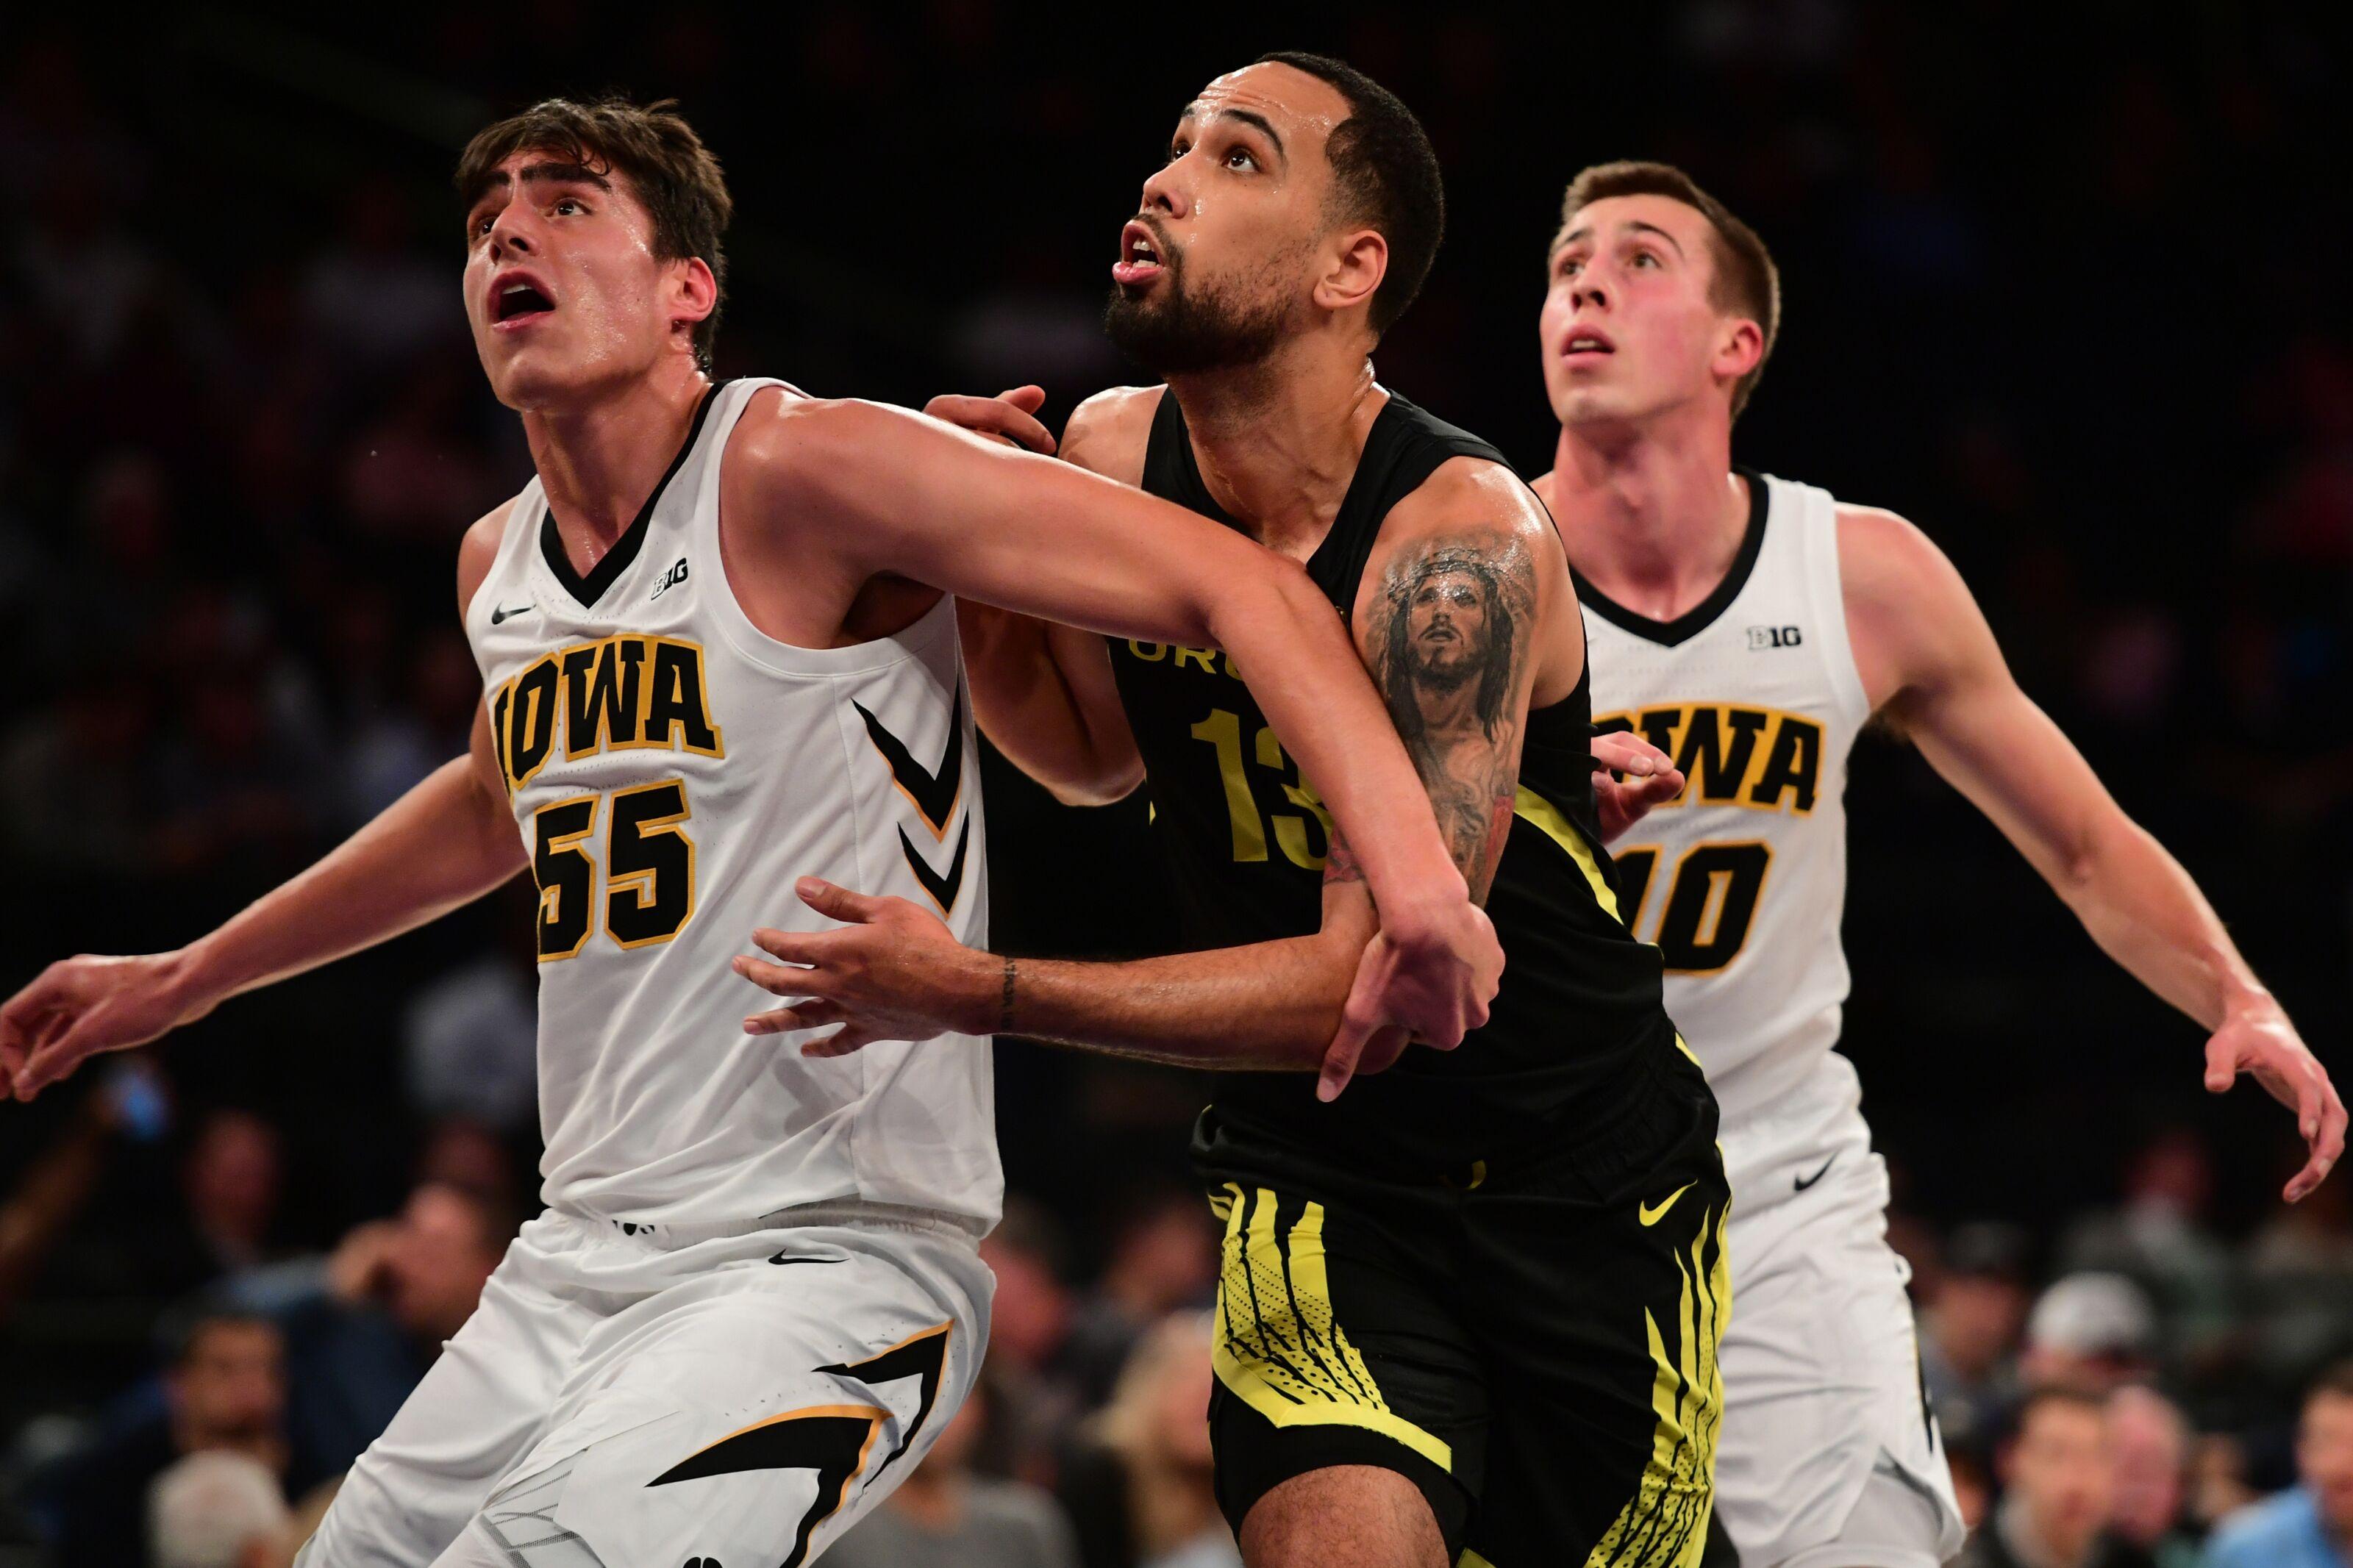 Iowa basketball: Men and women's team fall in latest rankings